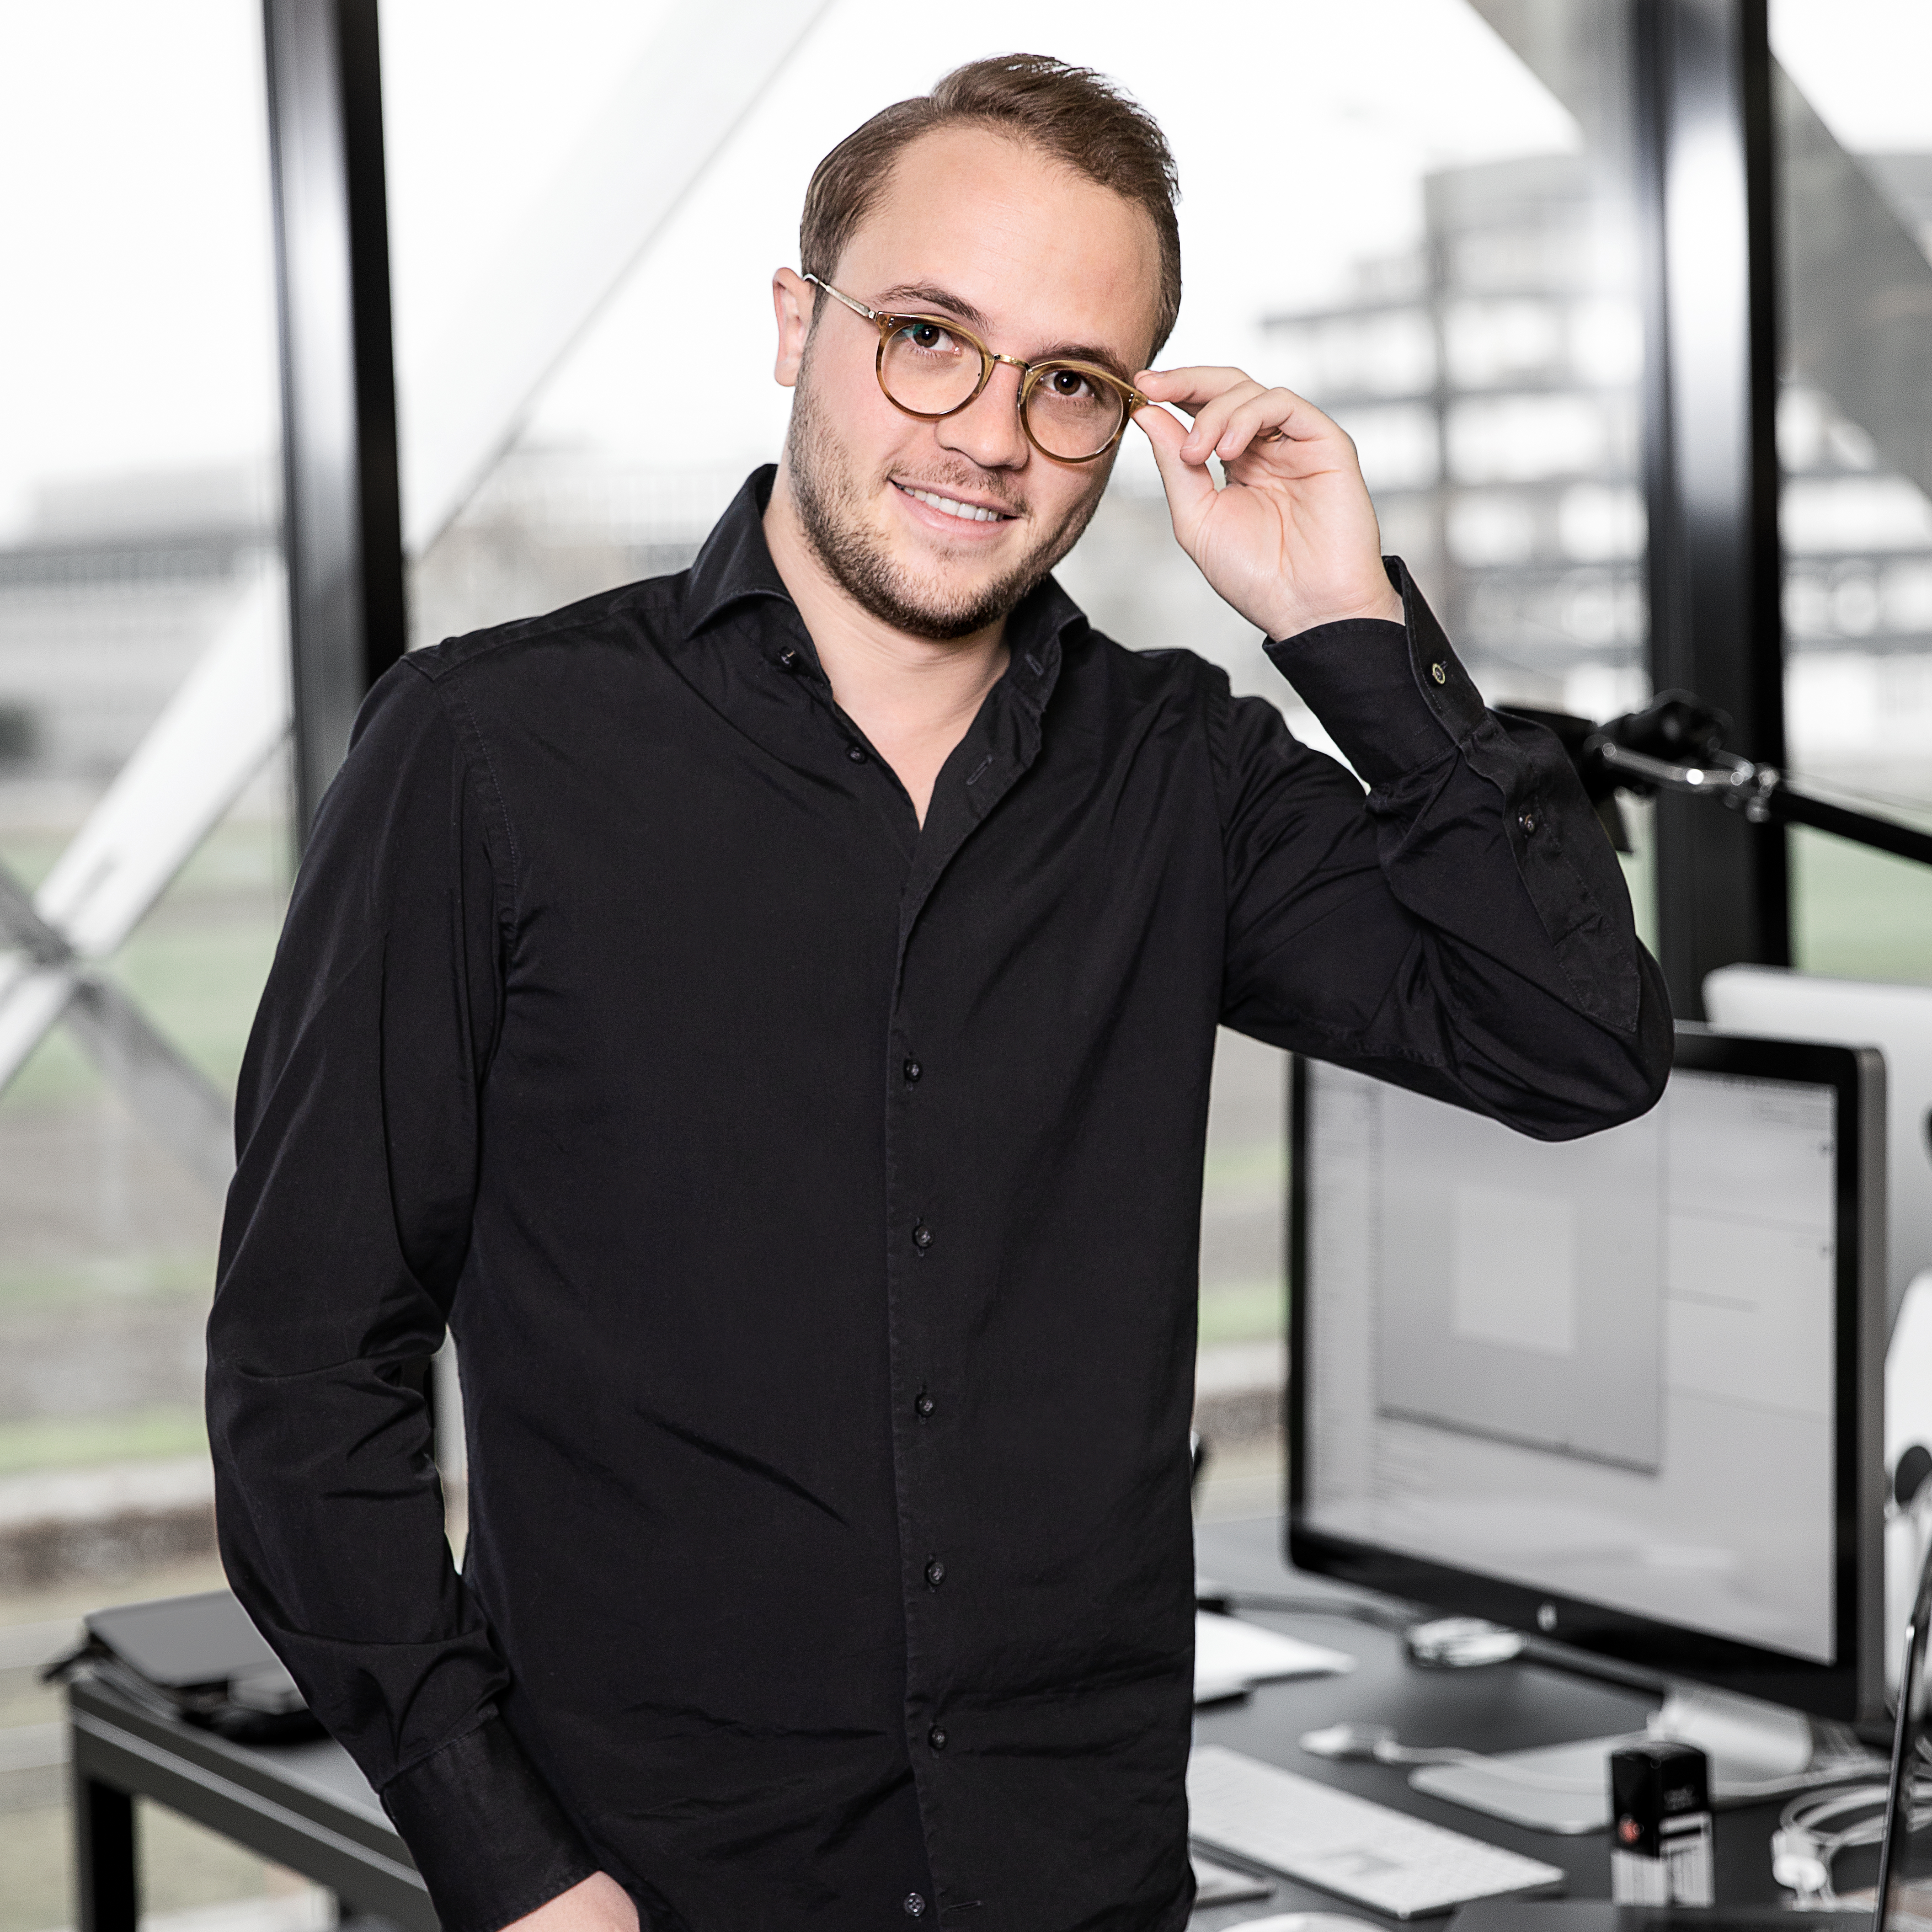 Carlo Hauser